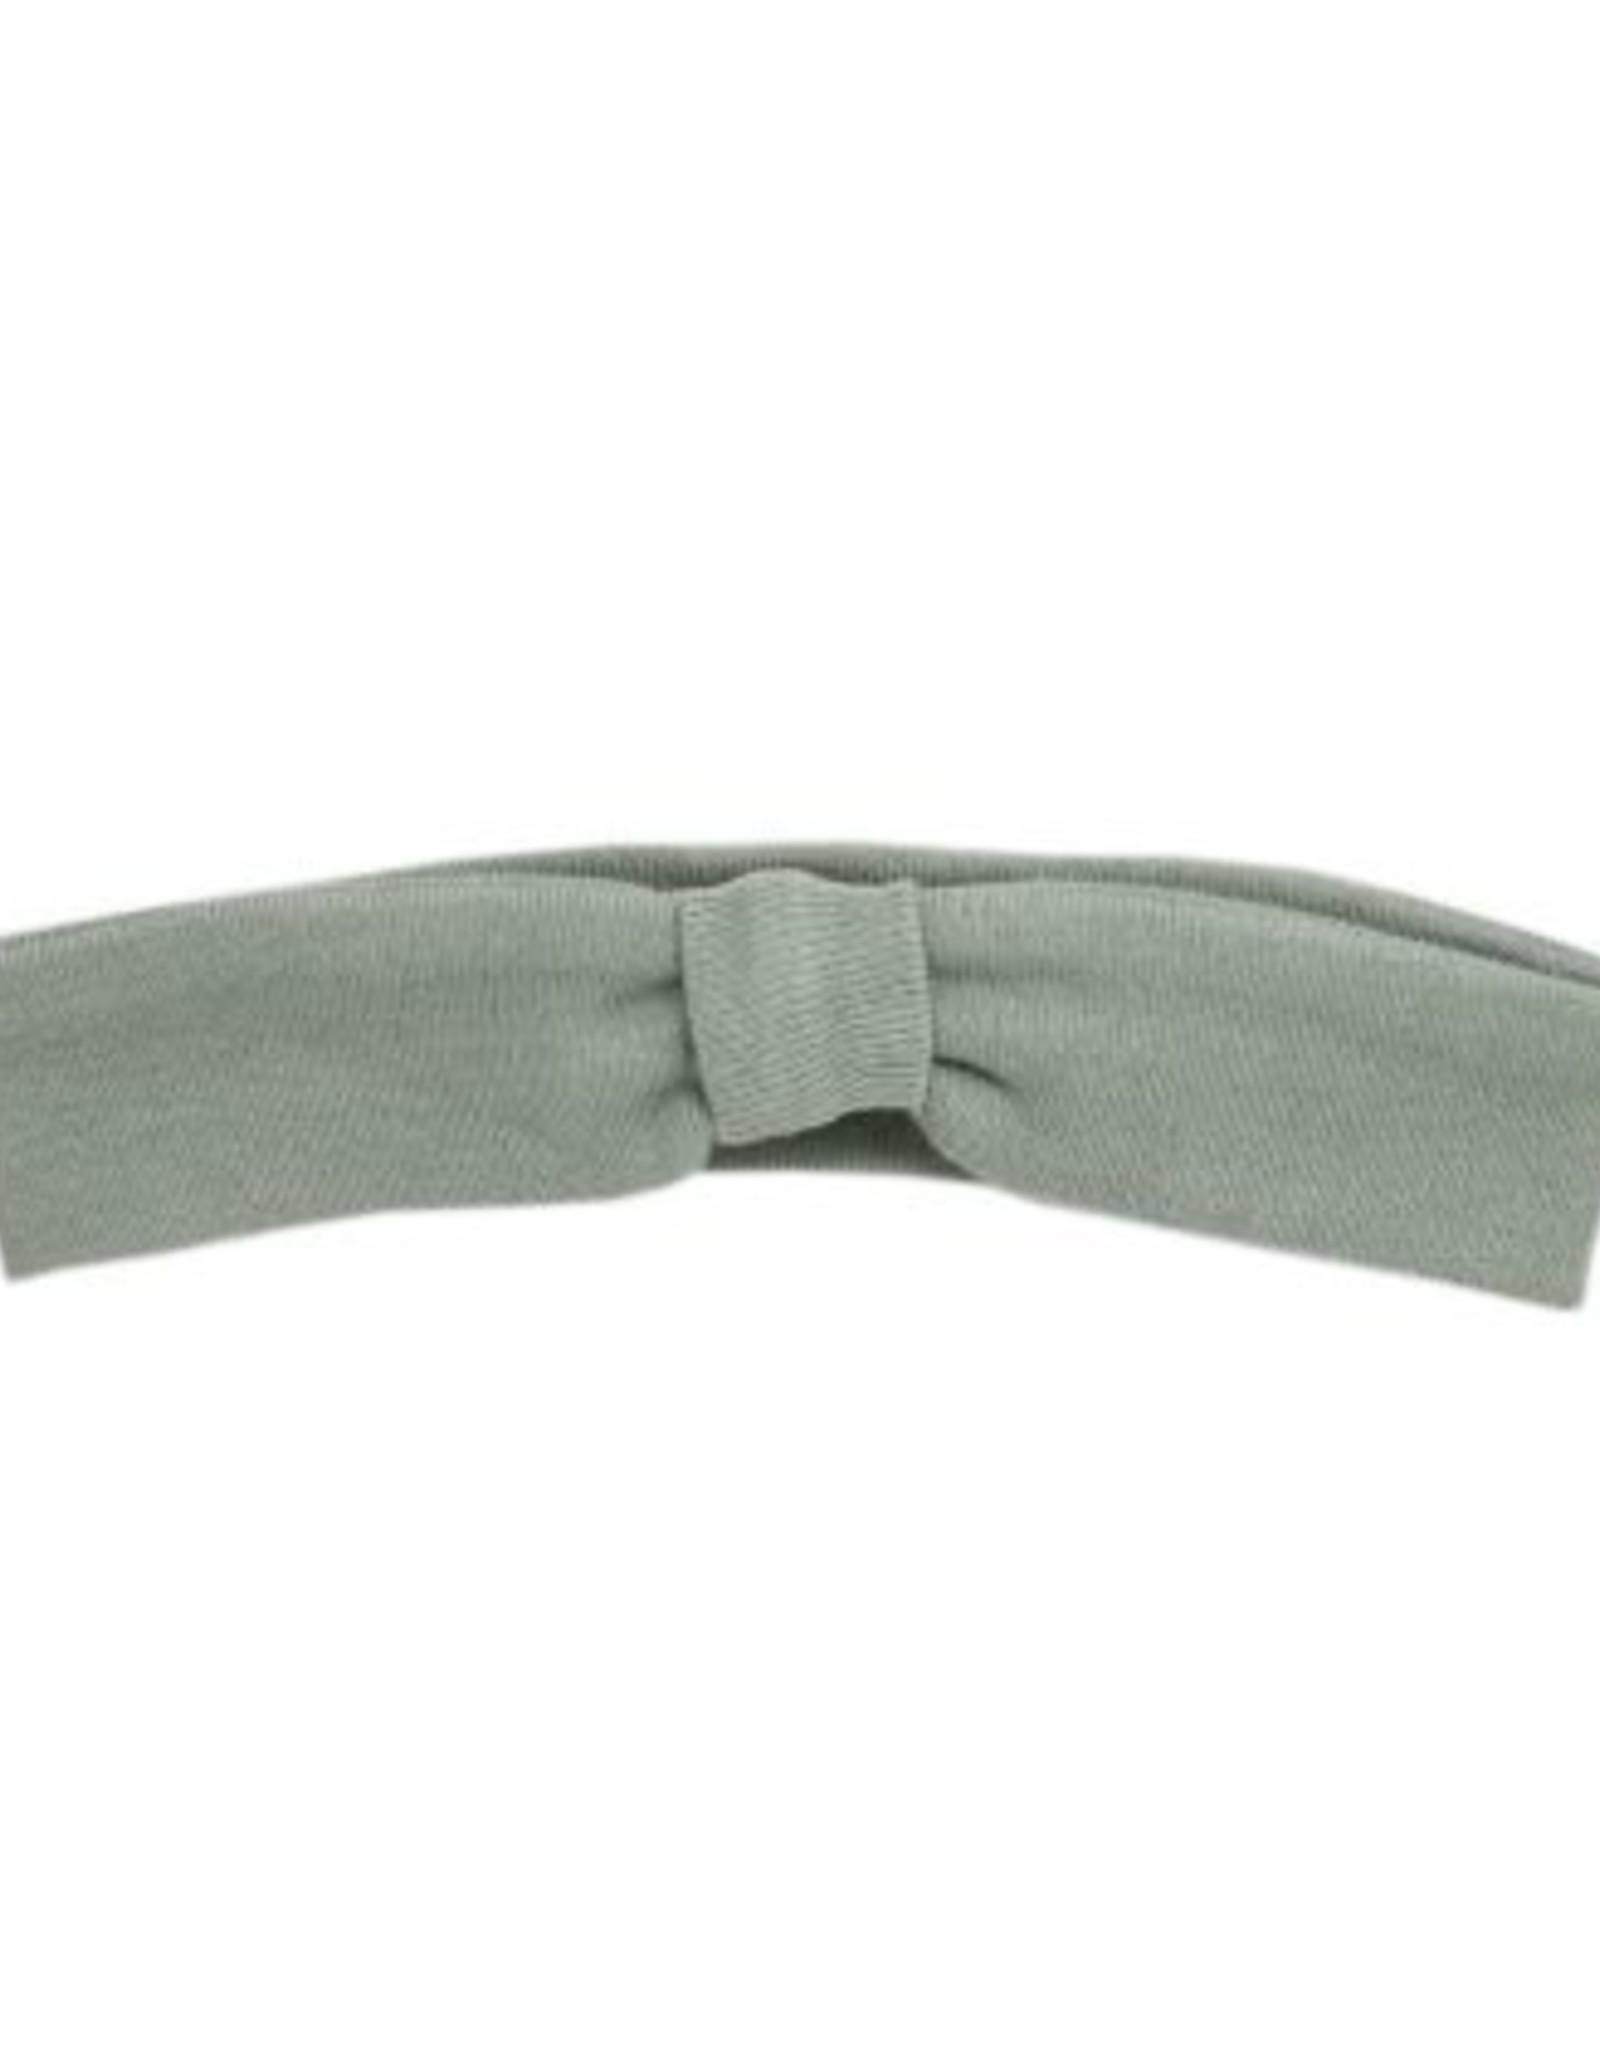 L'oved Baby Organic Headband- Seafoam